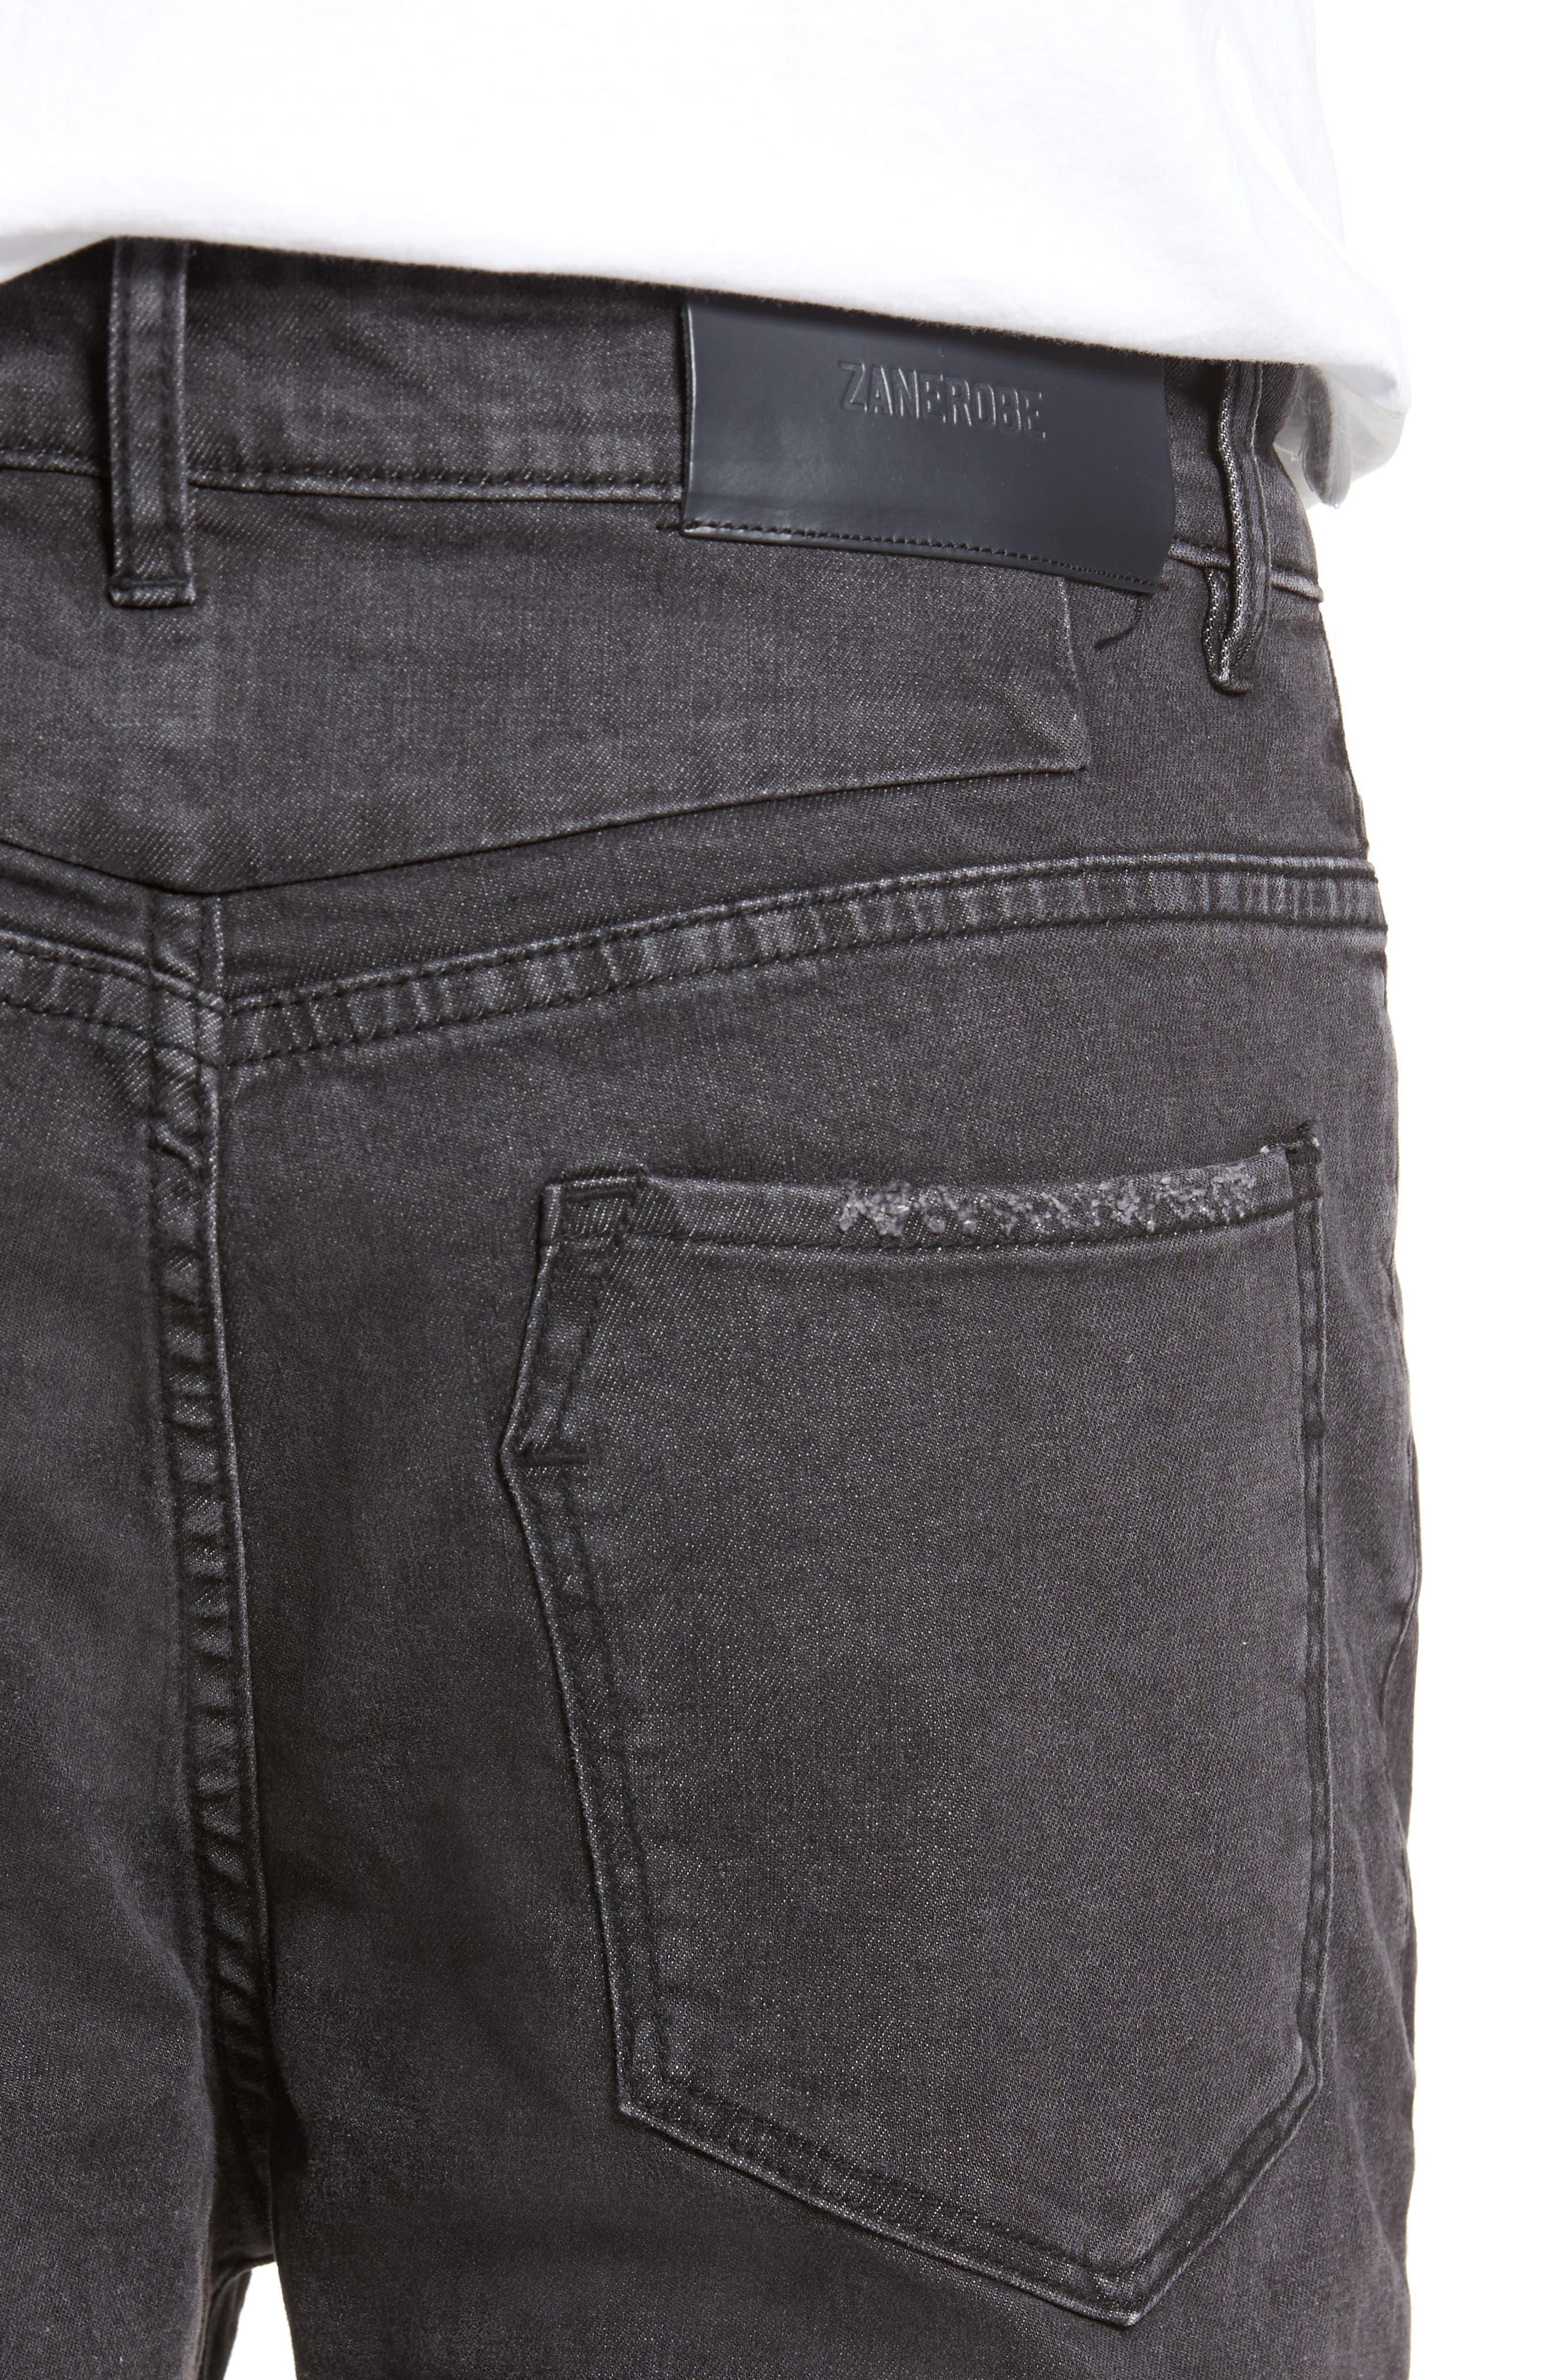 Alternate Image 4  - ZANEROBE Joe Blow Destroyed Denim Jeans